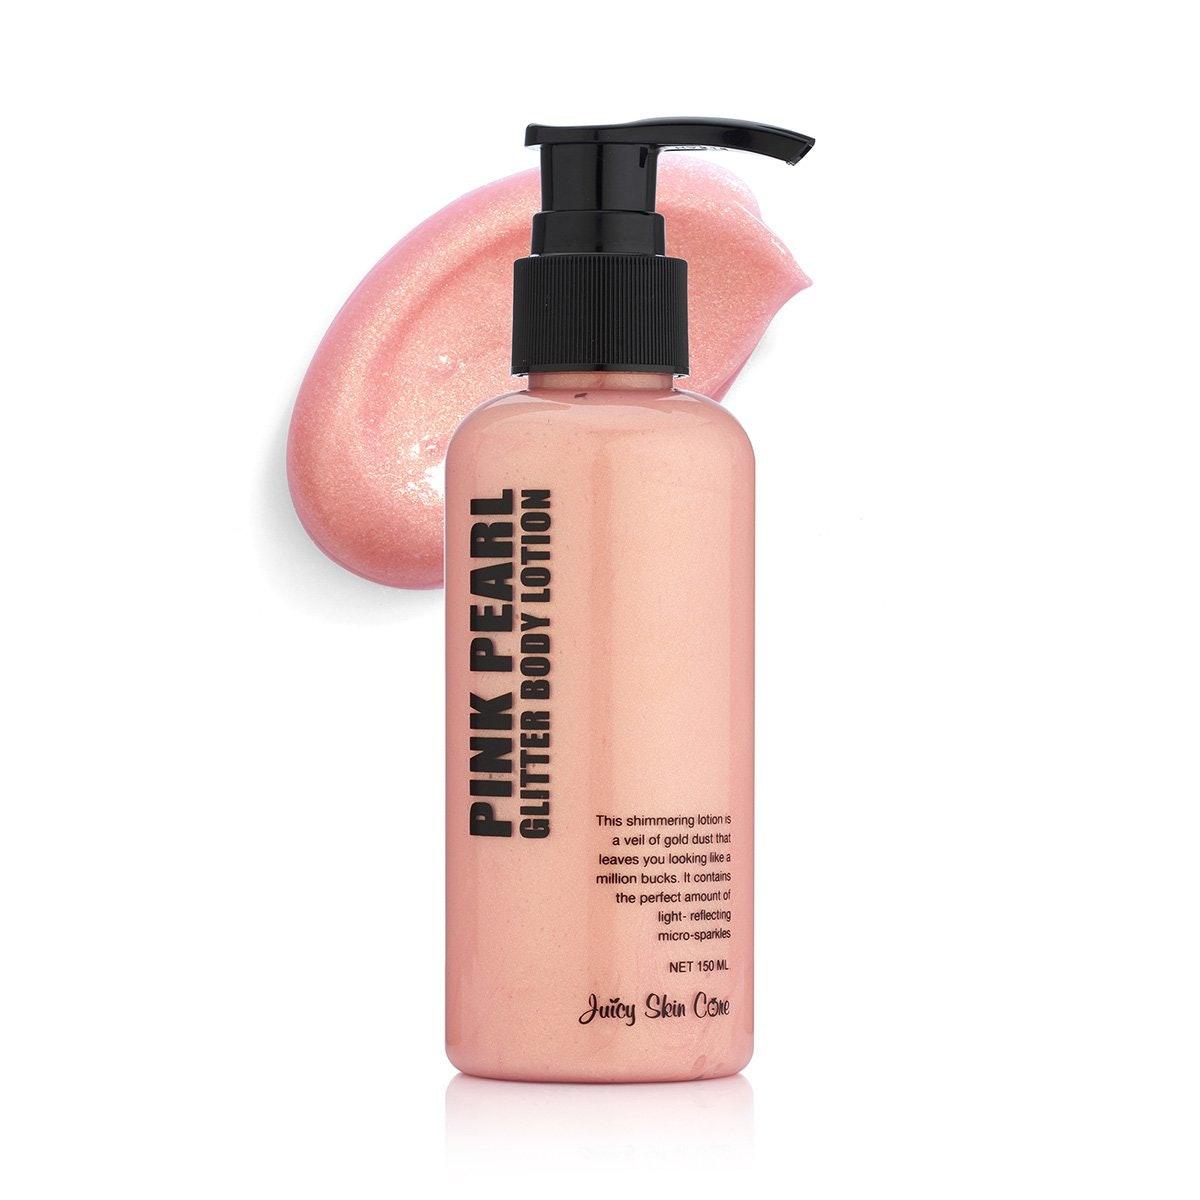 Juicy Skin Care Glitter Body Lotion